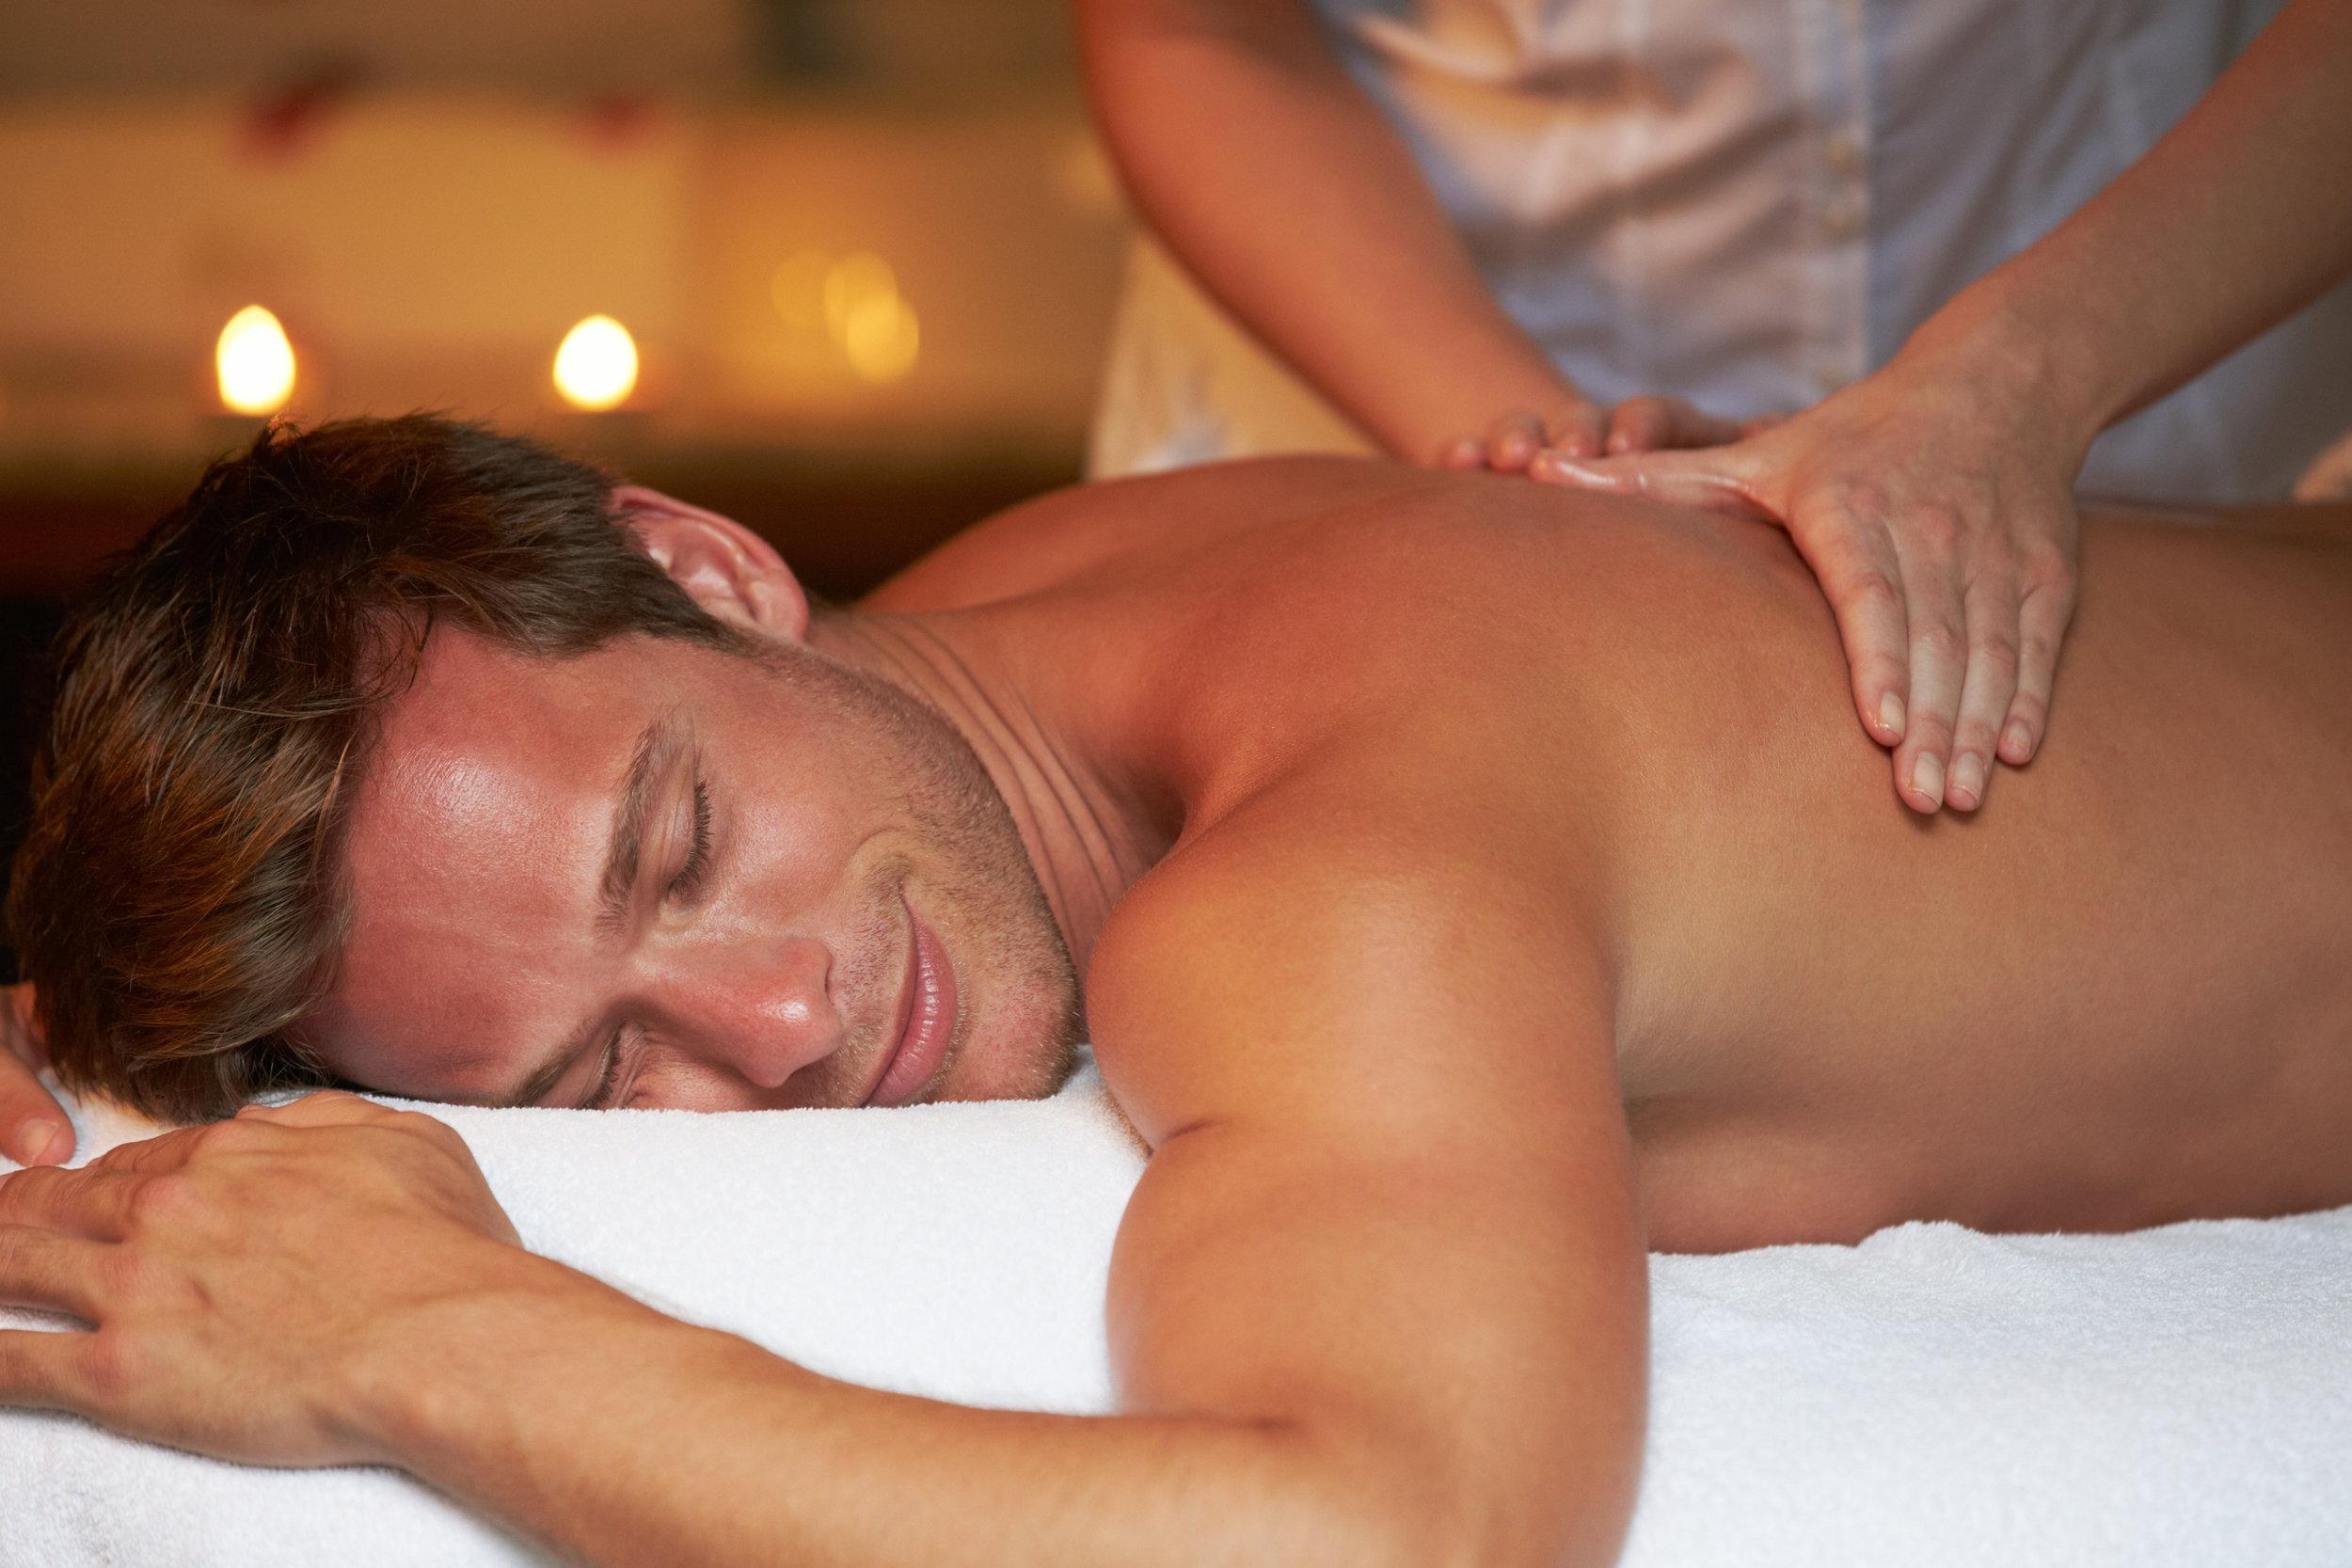 bigstock-Man-Having-Massage-In-Spa-47117983.jpg